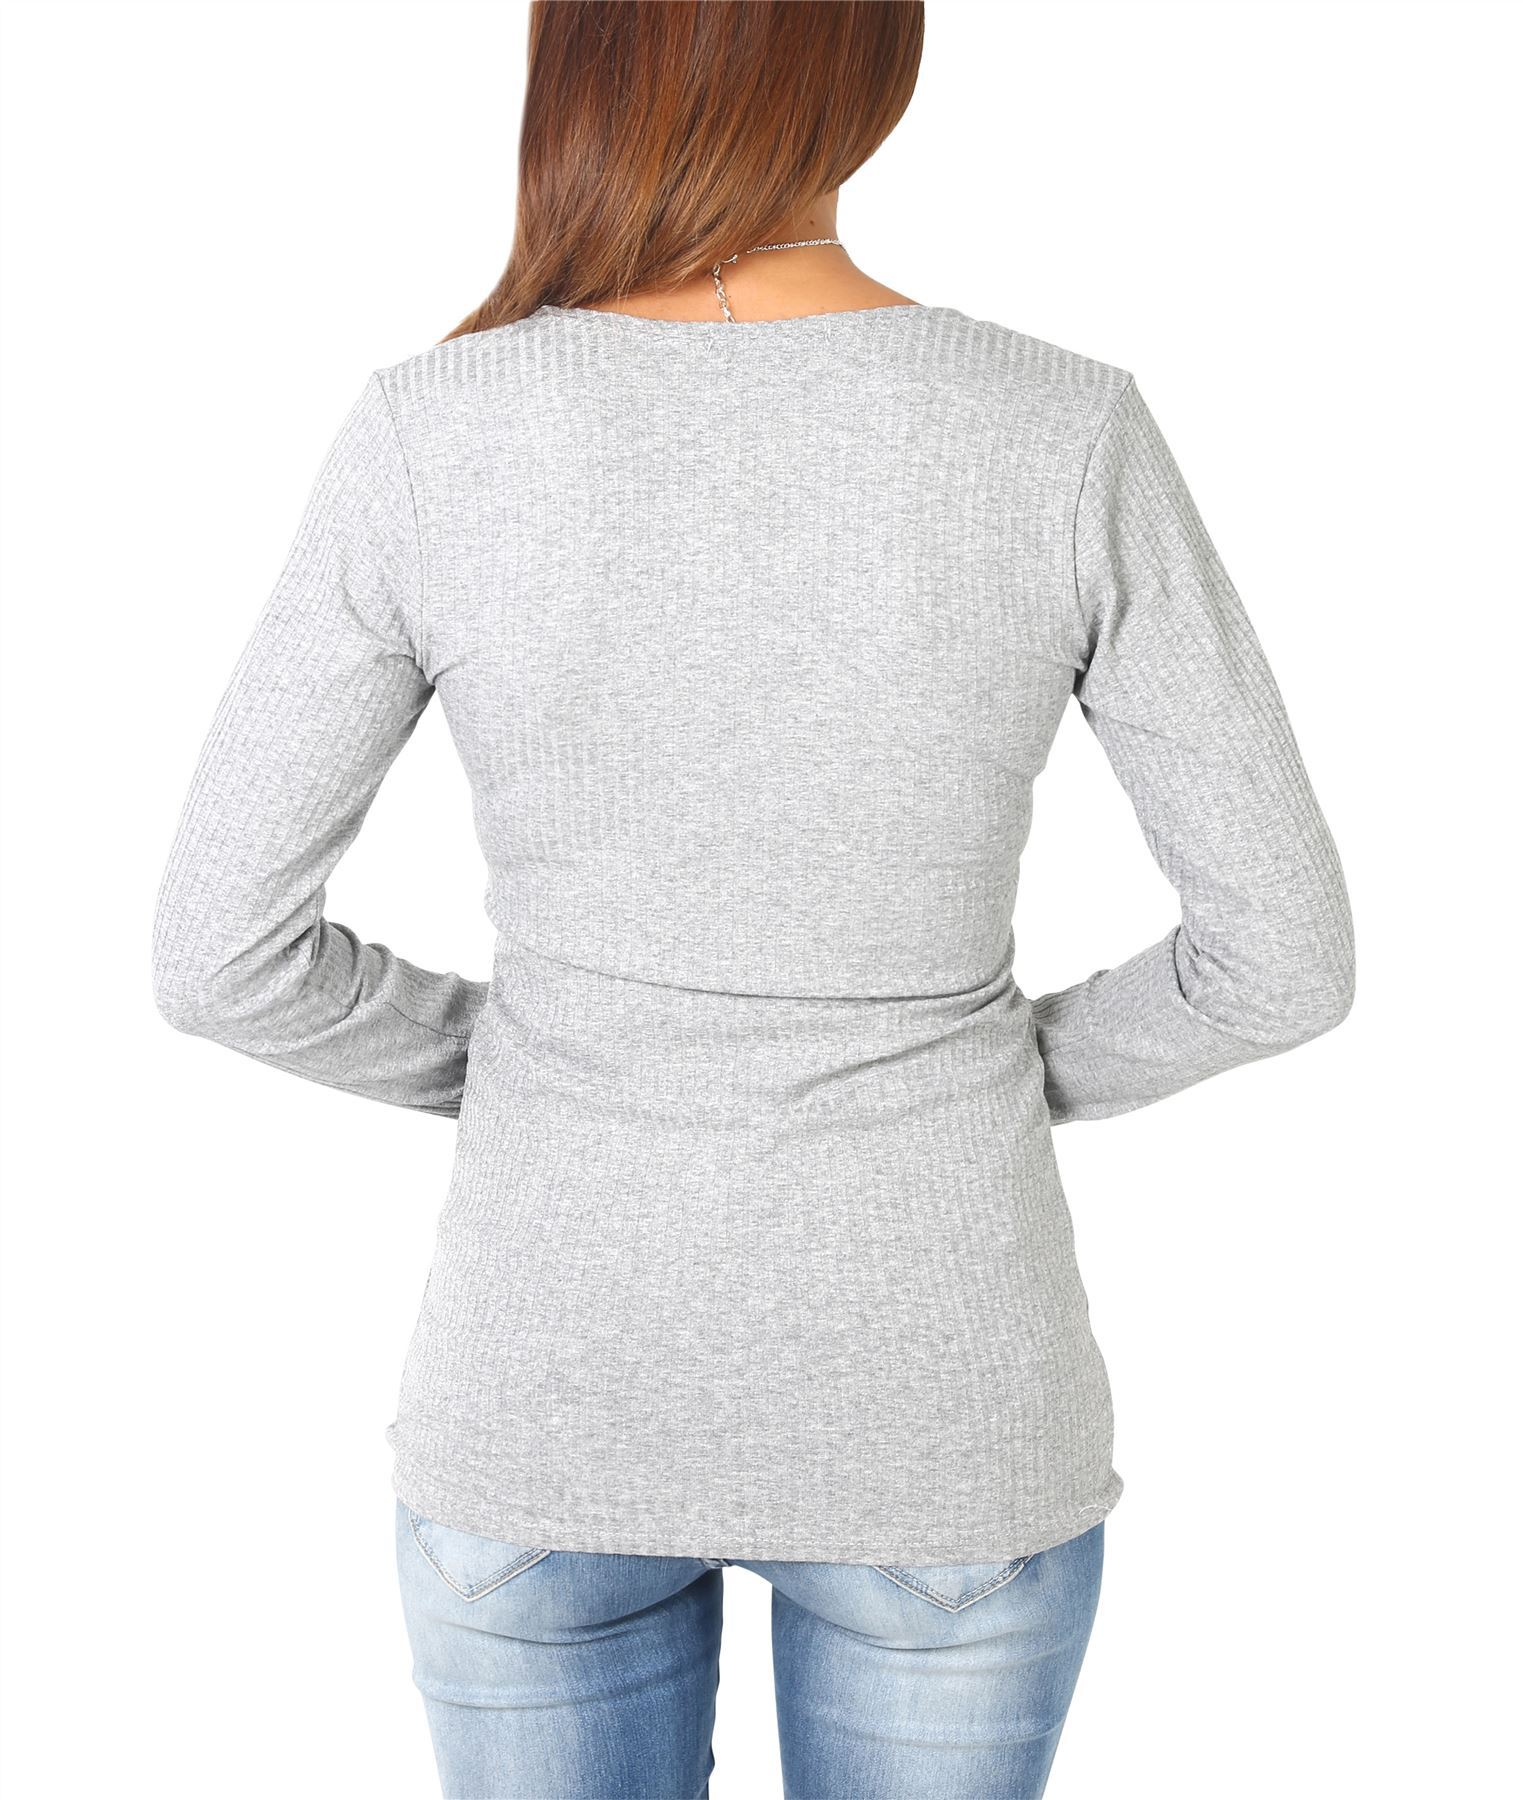 Rebeca-Mujer-Corta-Botones-Basica-Acanalada-Barata-Oferta-Casual-Ligera-Fina miniatura 15